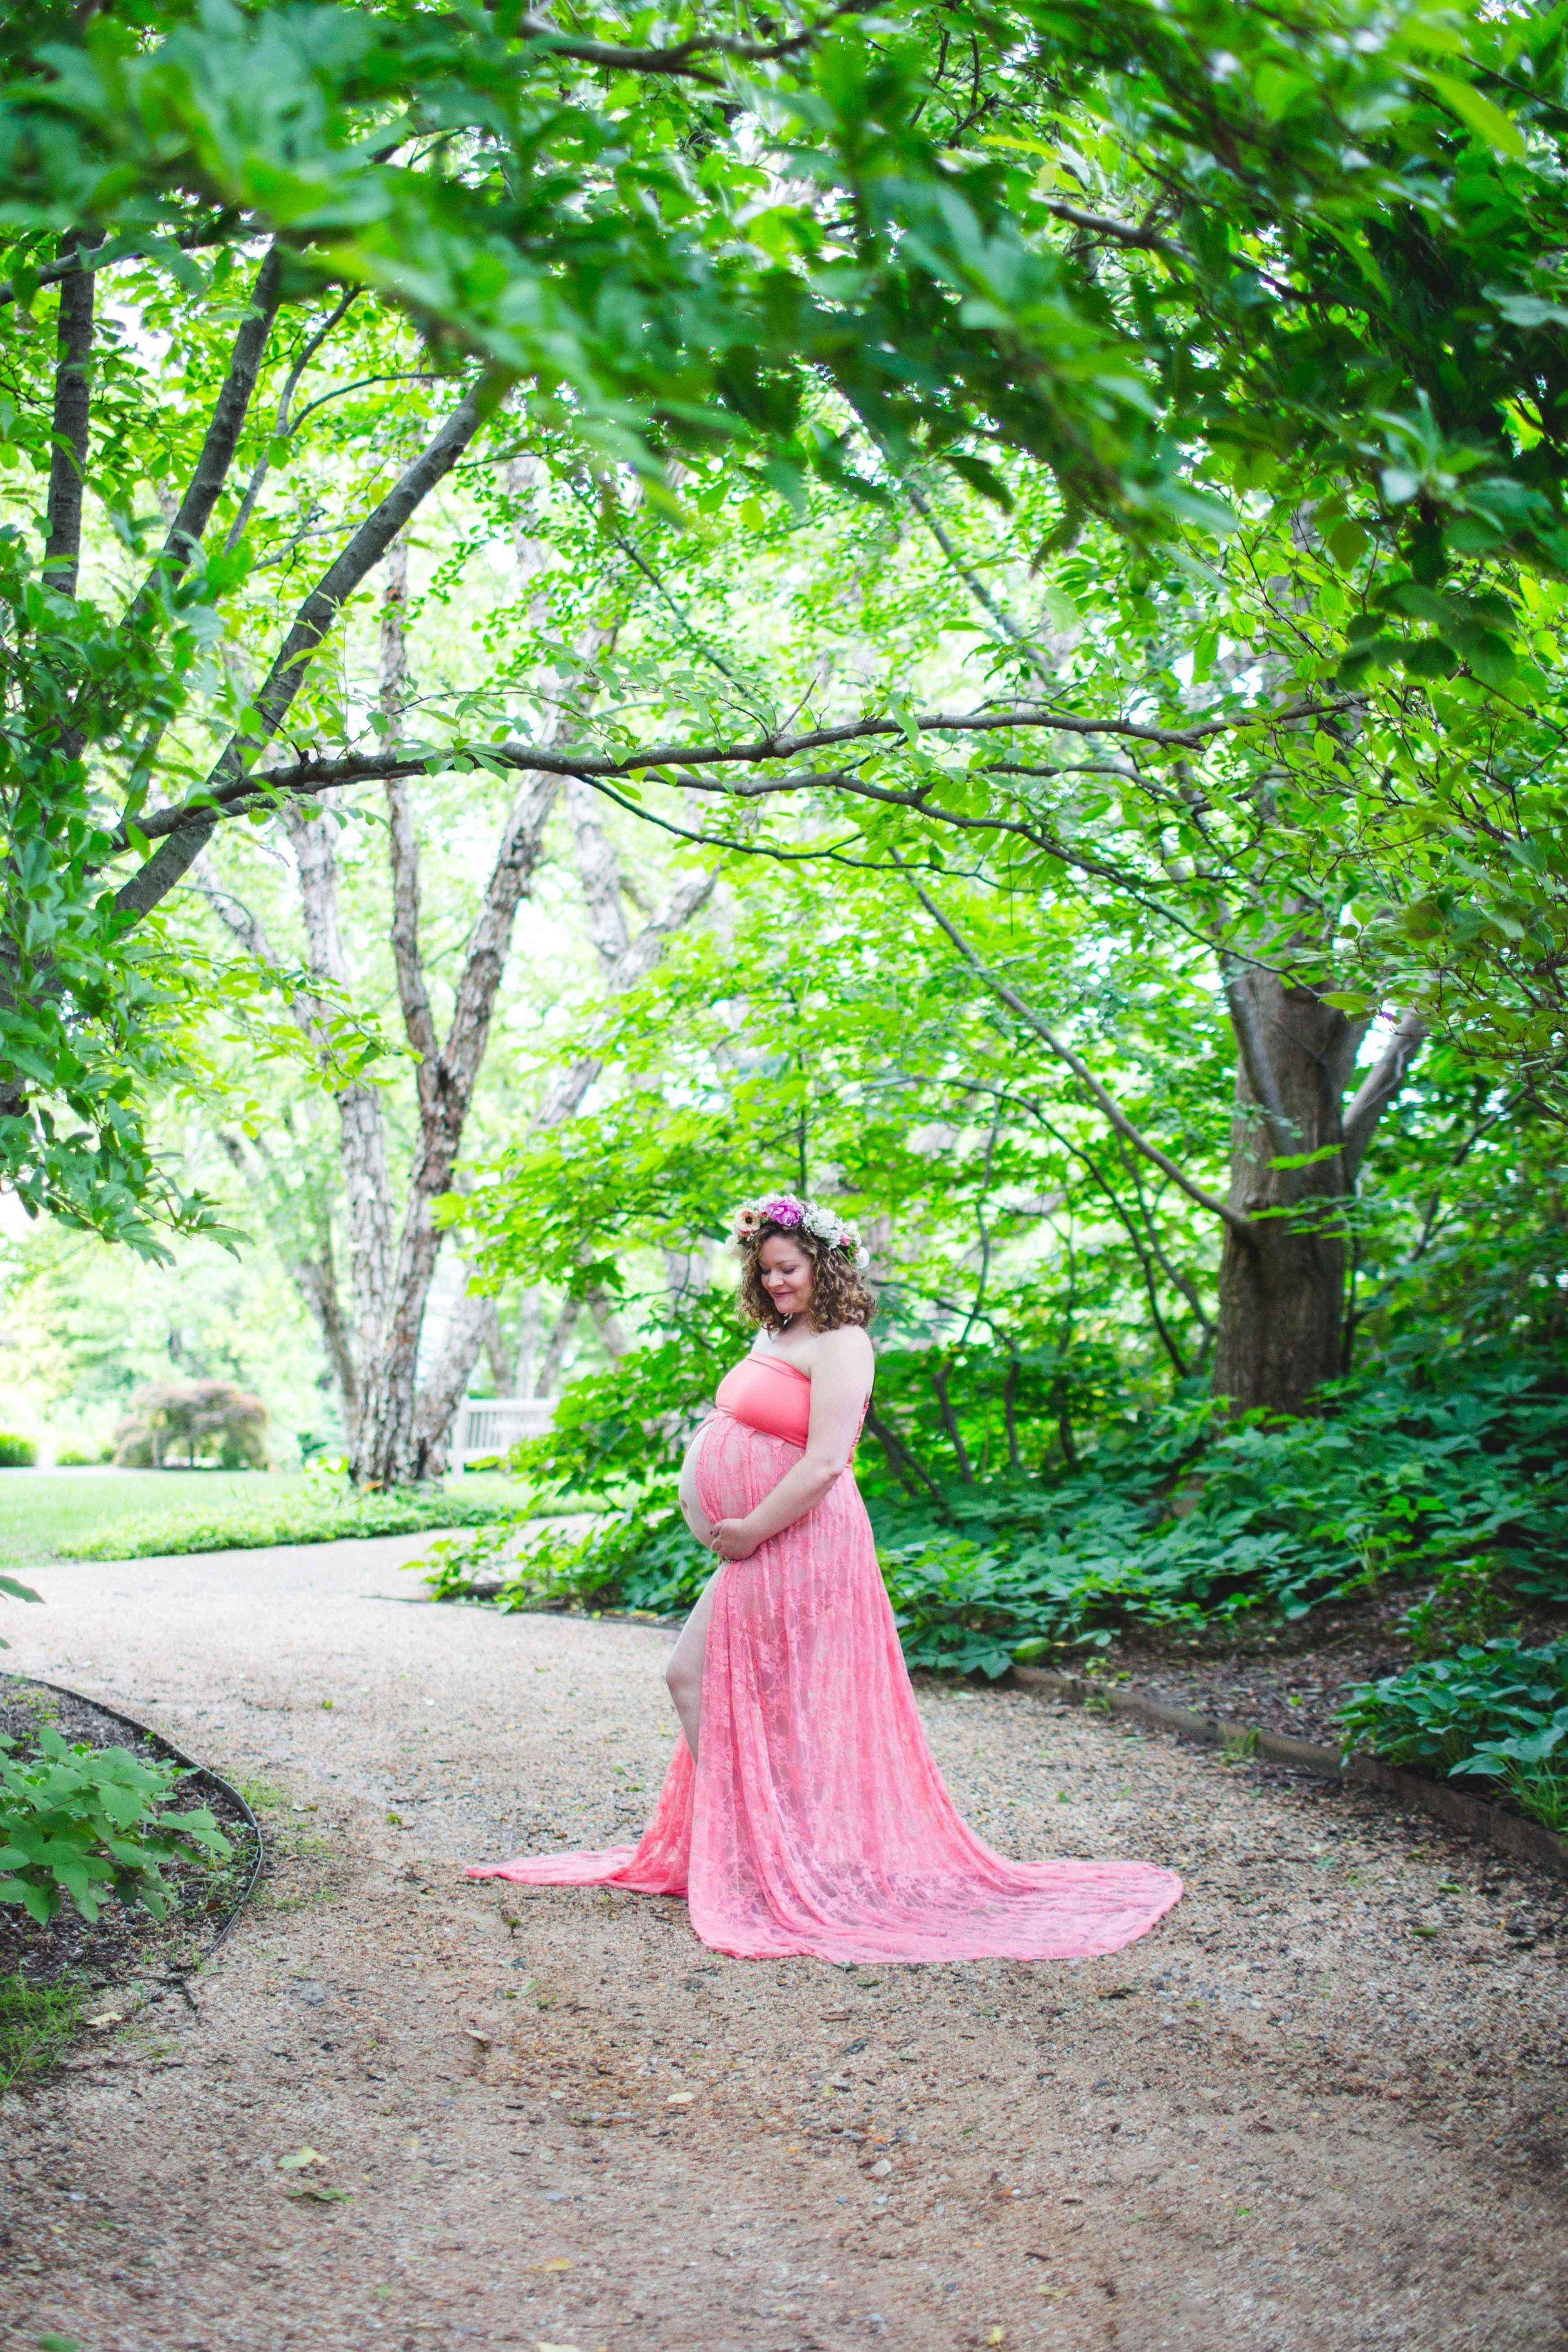 roanoke-maternity-photographer-3.jpg